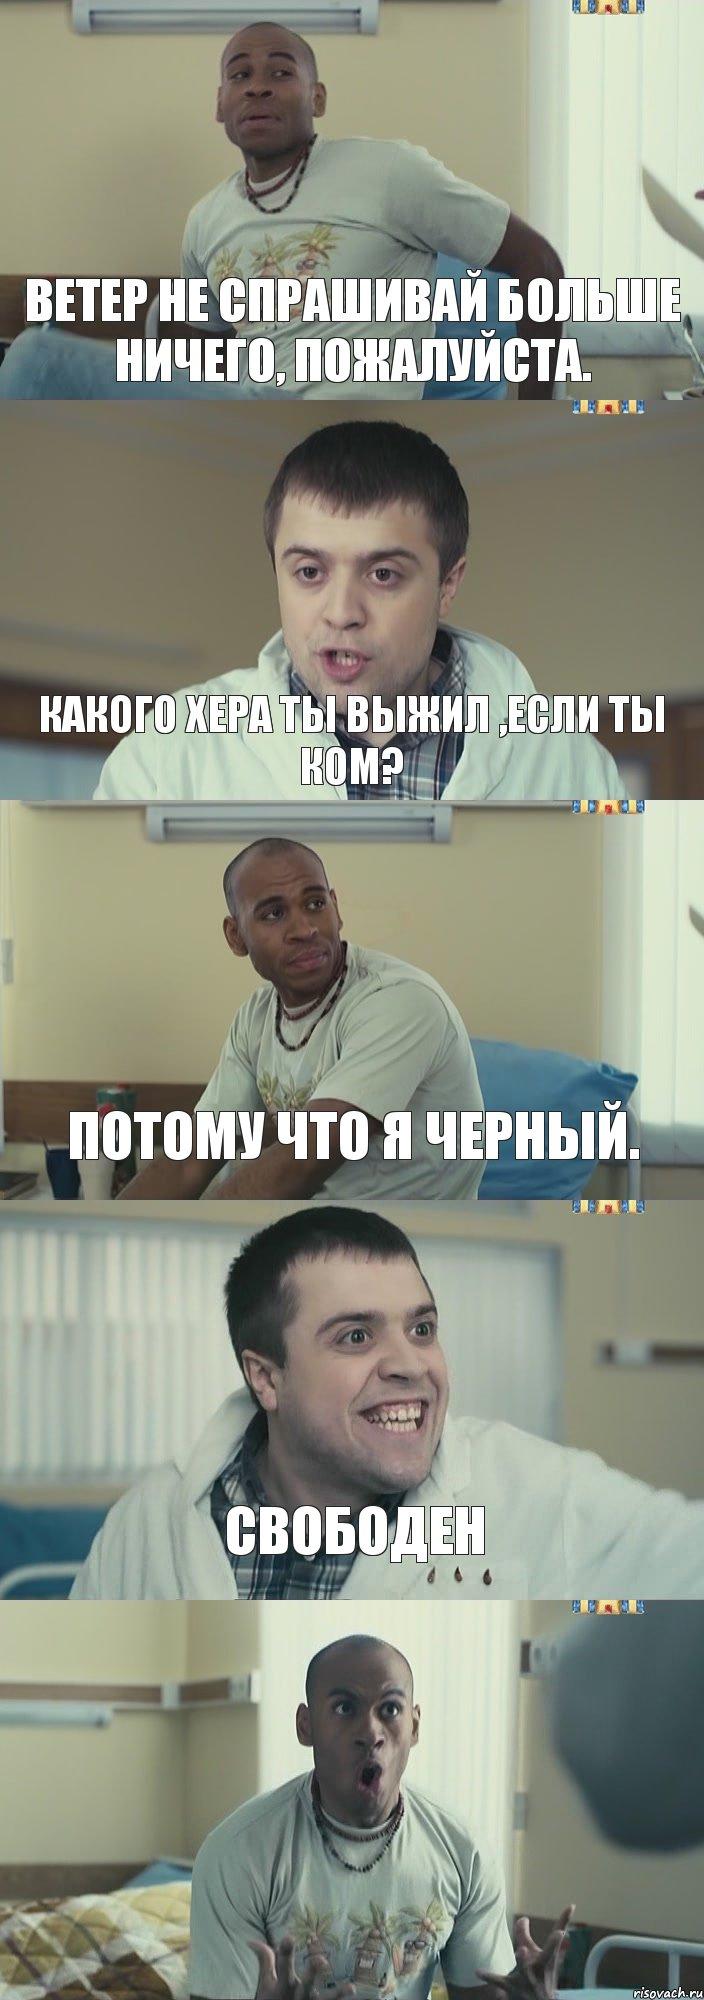 lyublyu-sosat-uhta